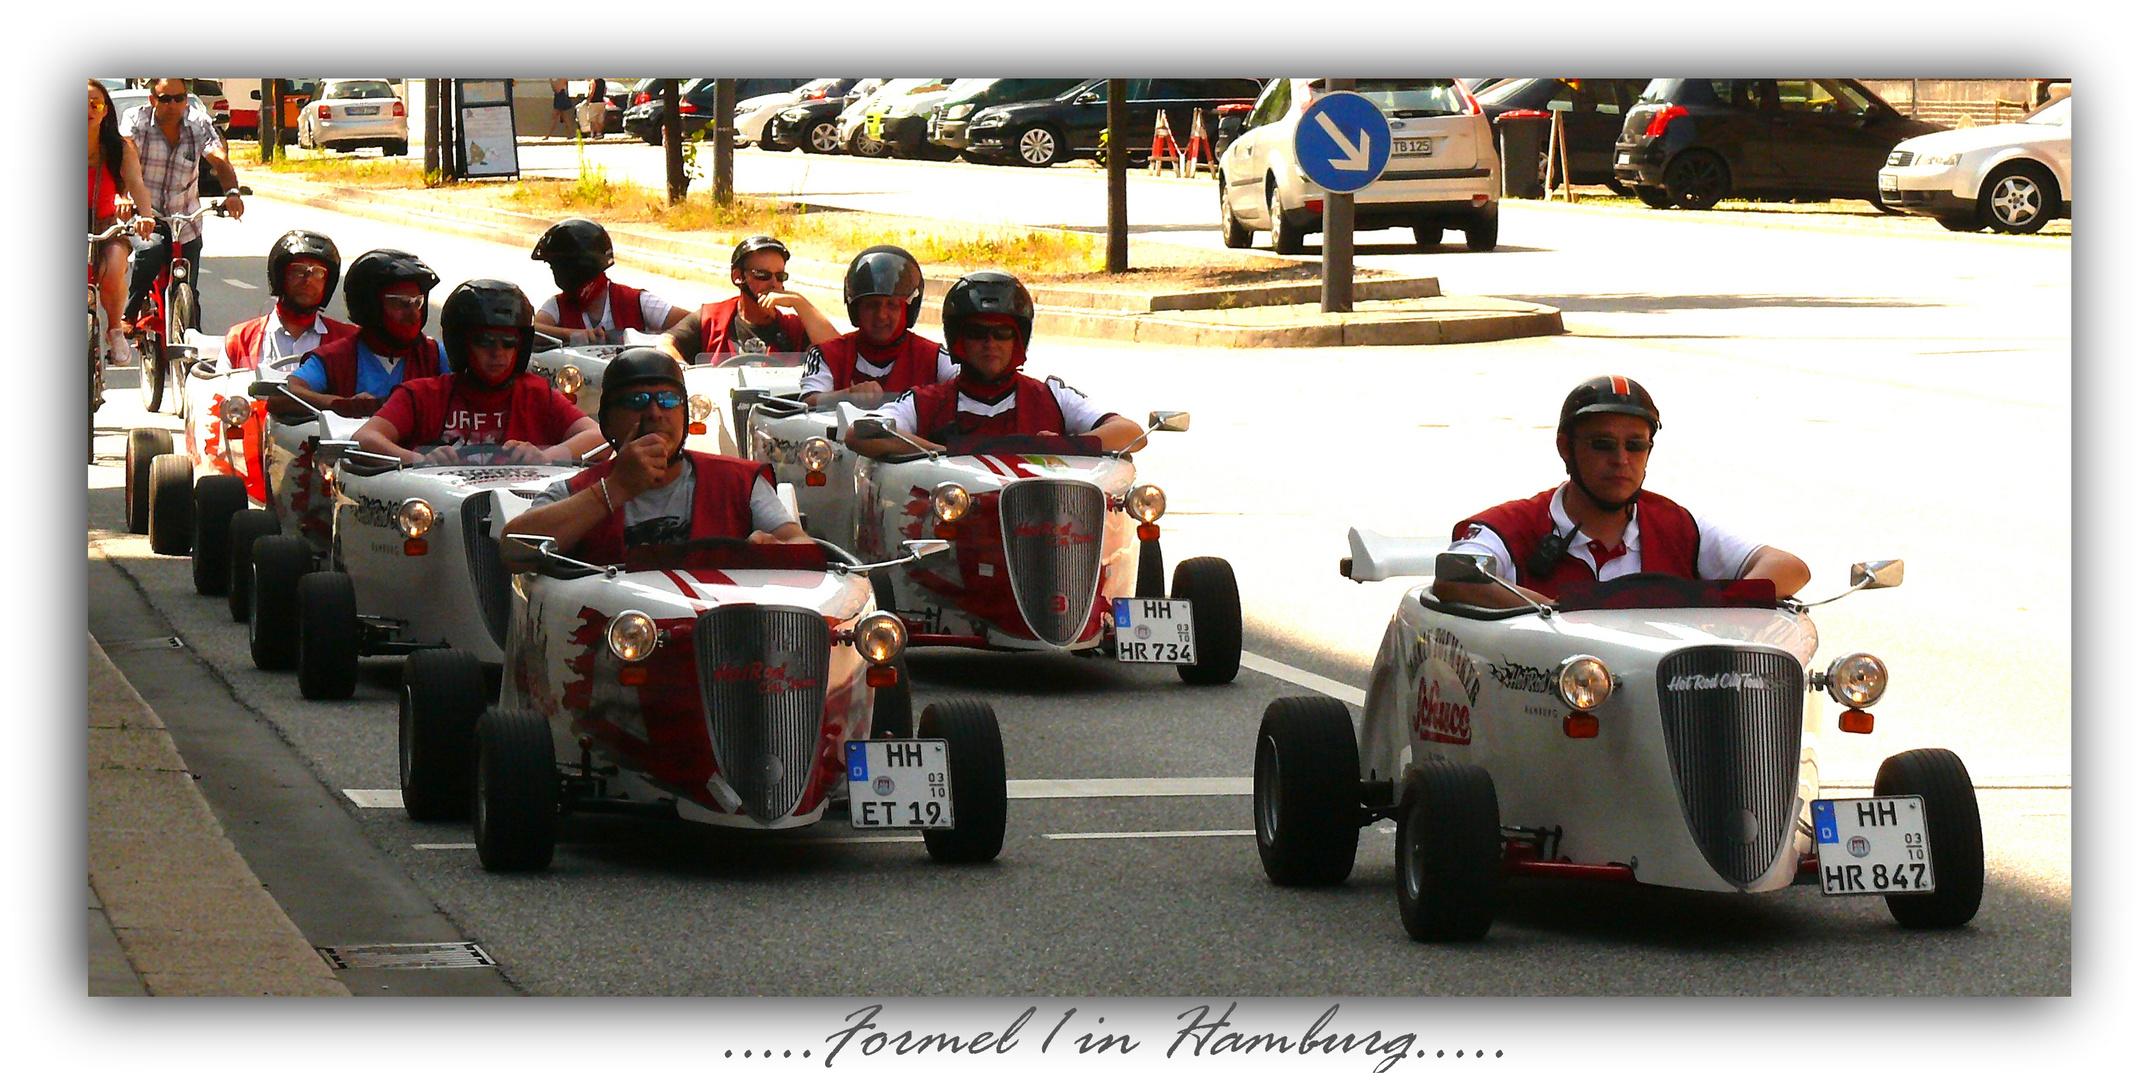 ....Formel 1 in Hamburg...